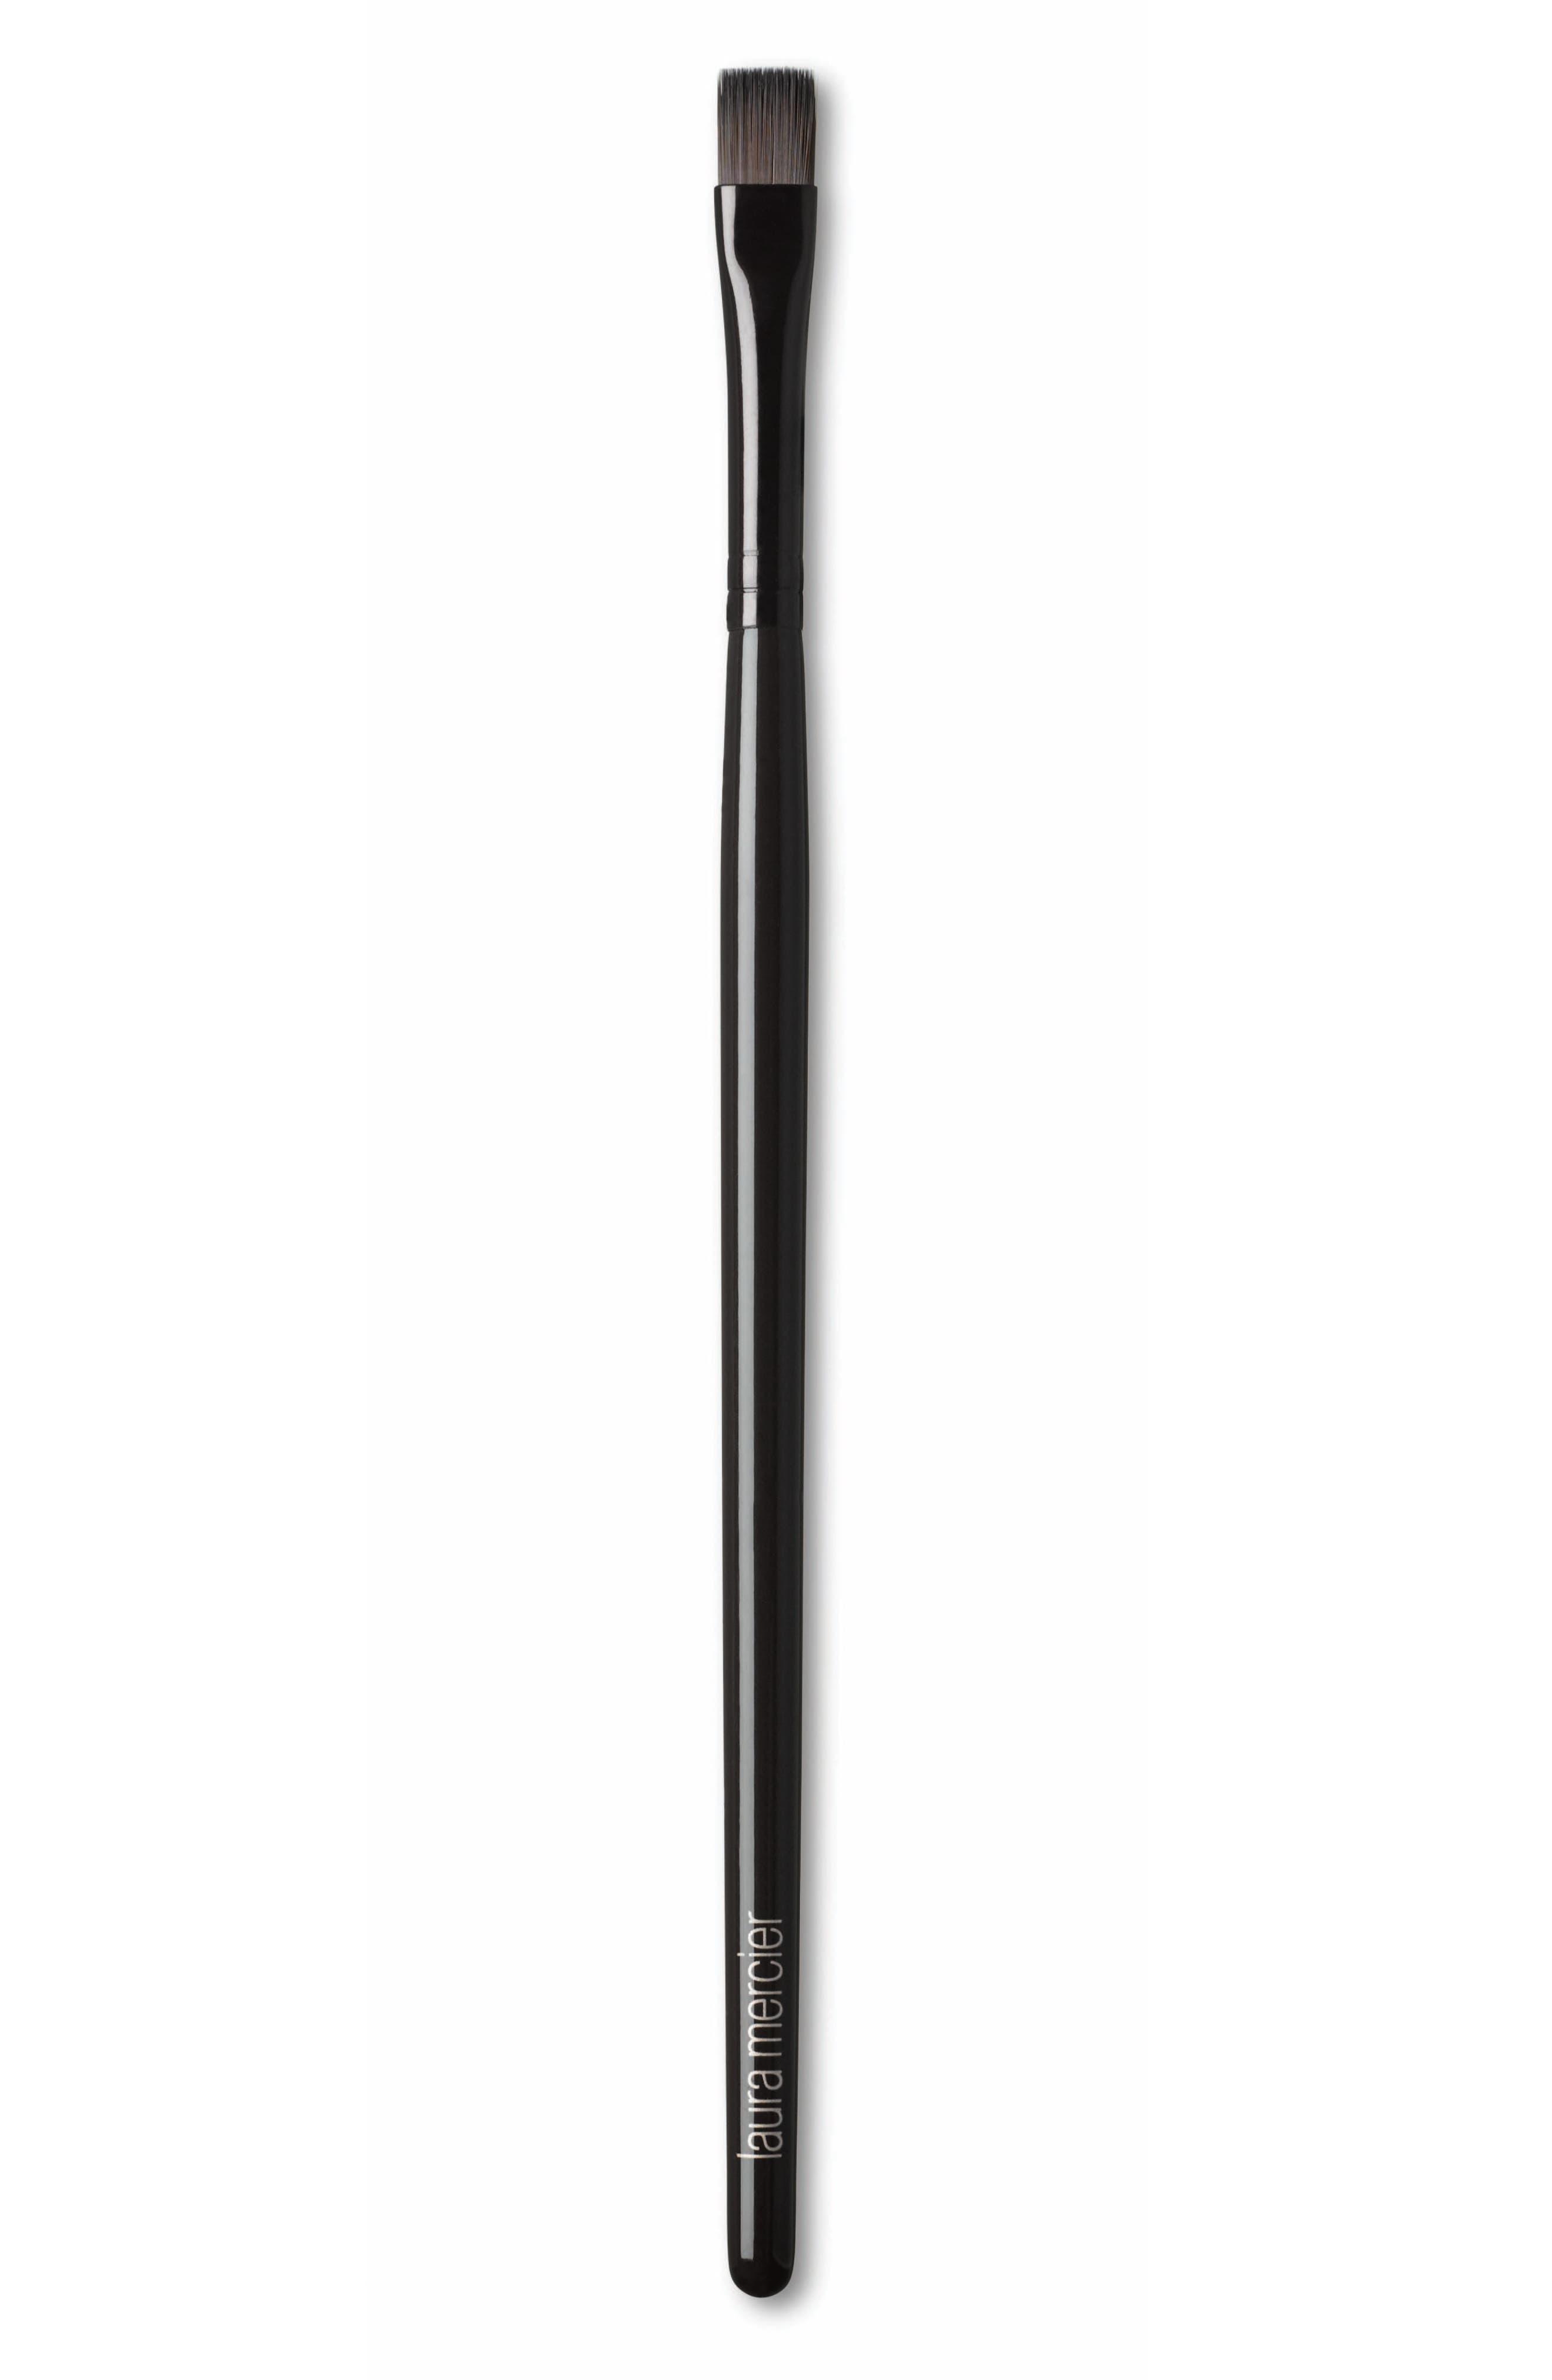 Flat Eyeliner Brush,                         Main,                         color, NO COLOR